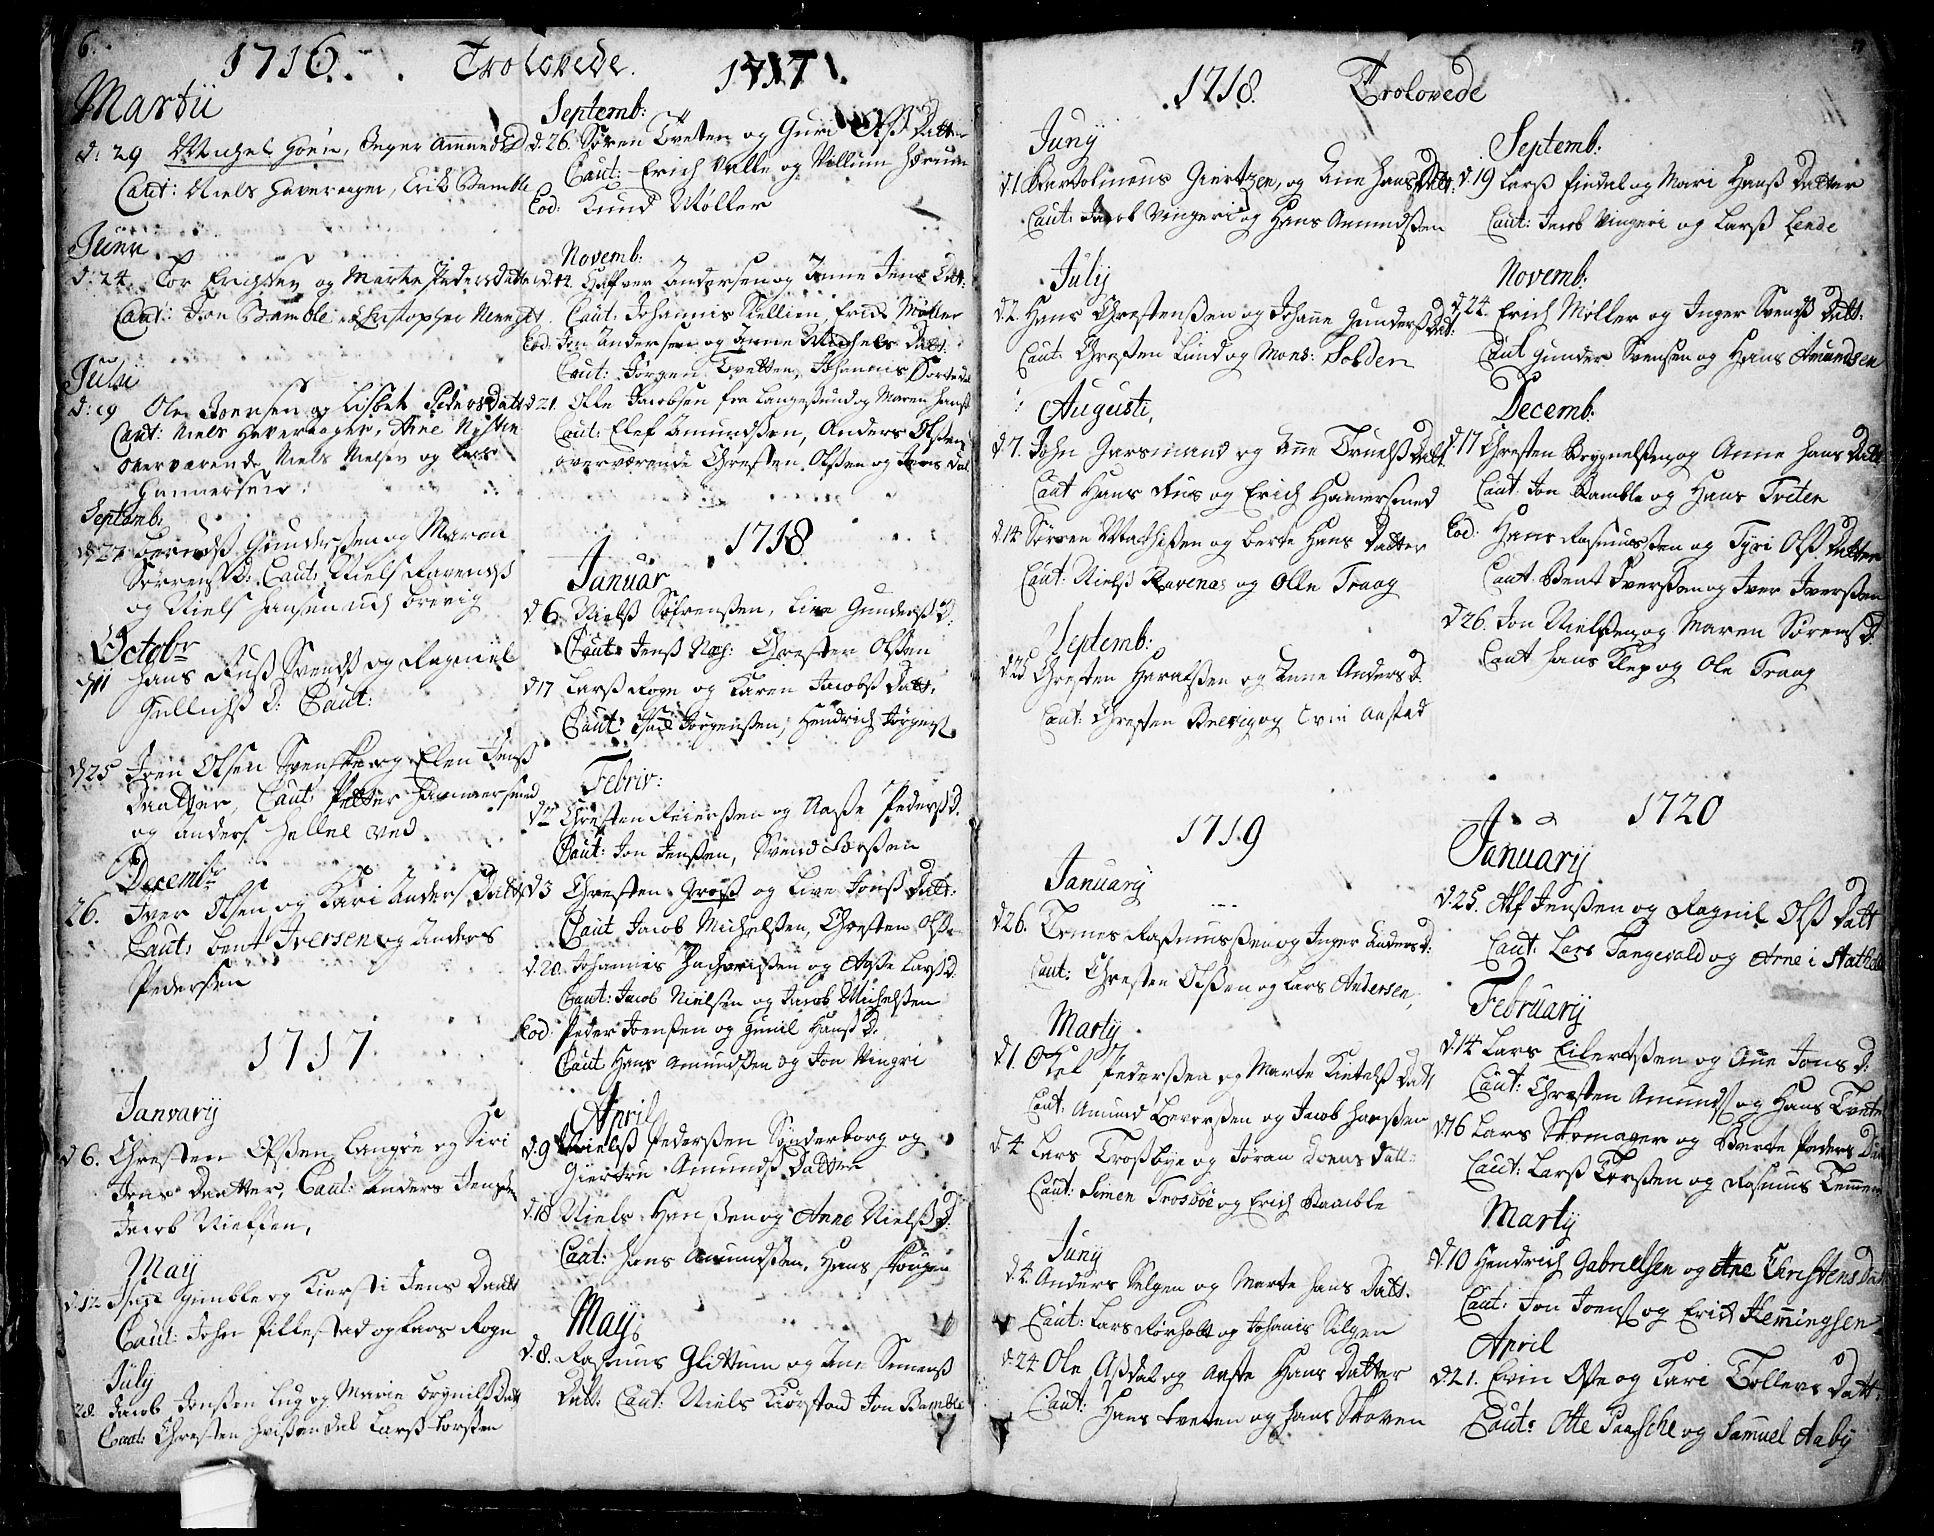 SAKO, Bamble kirkebøker, F/Fa/L0001: Ministerialbok nr. I 1, 1702-1774, s. 6-7